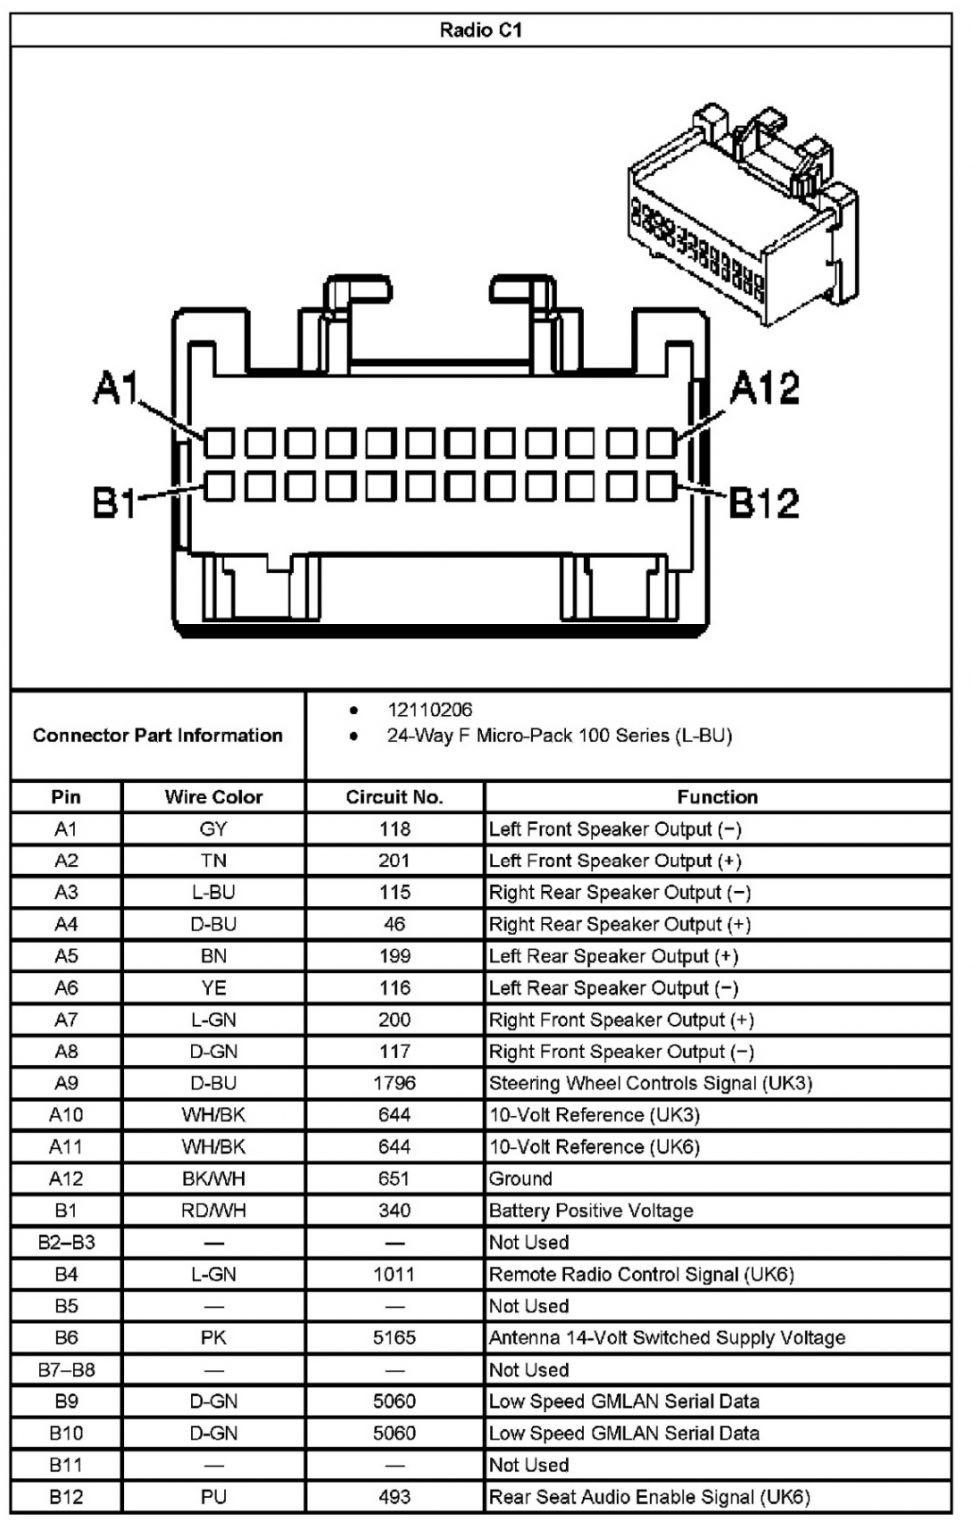 2005 Malibu Classic Radio Wiring Diagram Smart Wiring Diagrams \u2022 2005 Chevy  2500 Radio Wiring Diagram